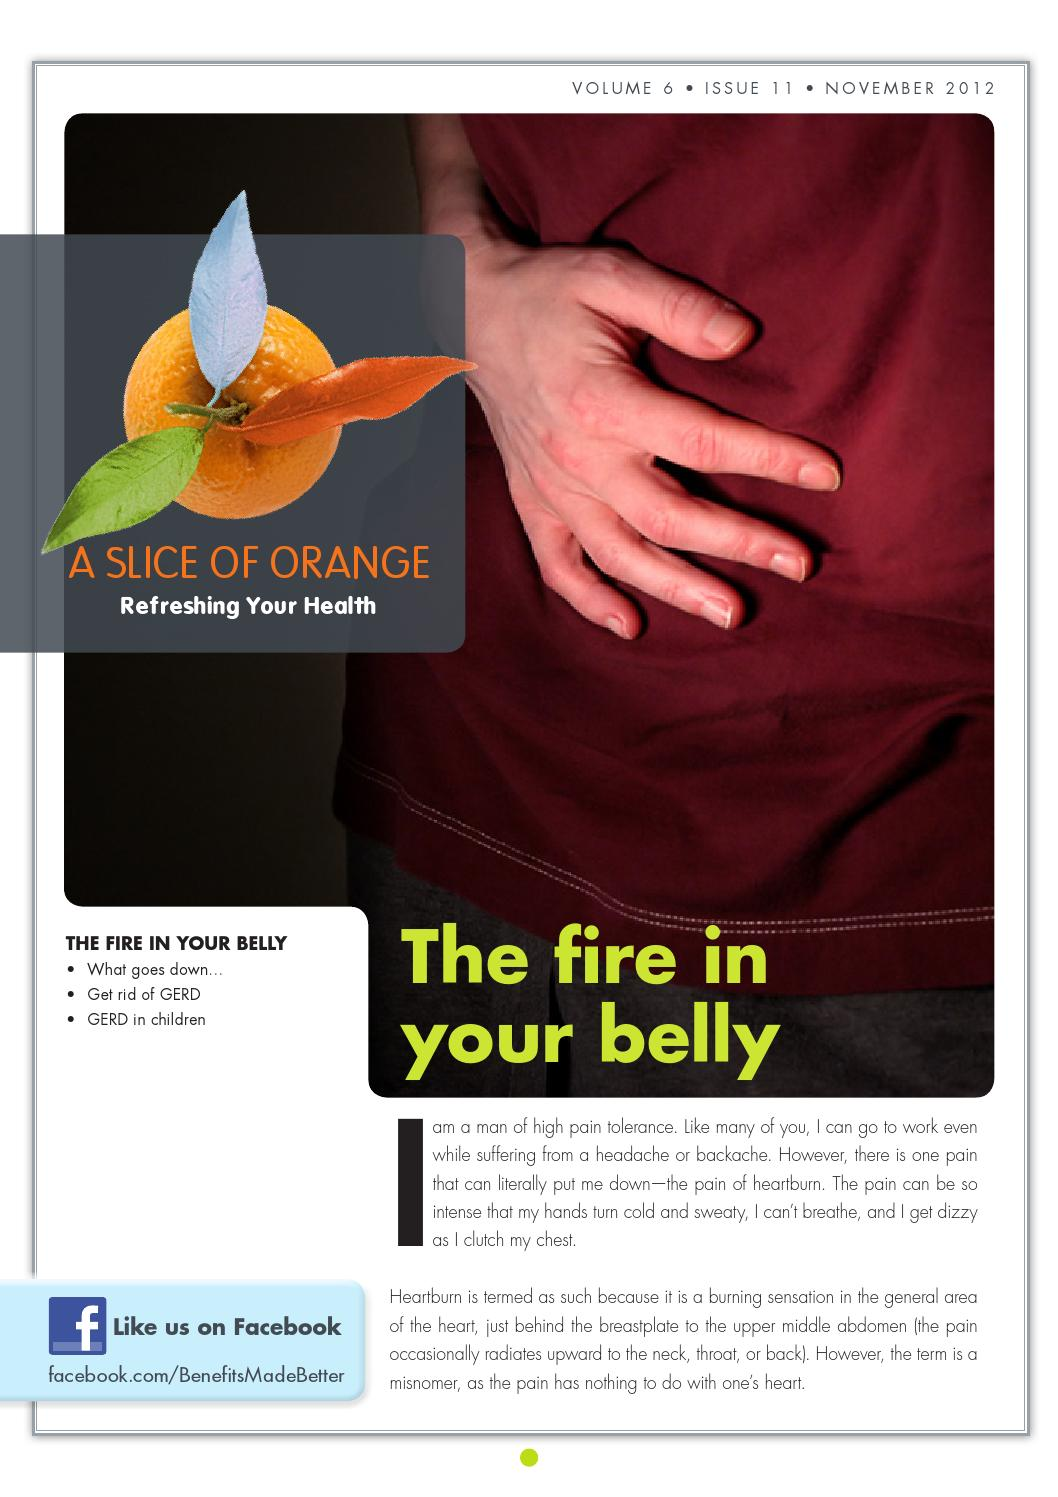 Stomach: A Slice of Orange - November 2012 - The fire in